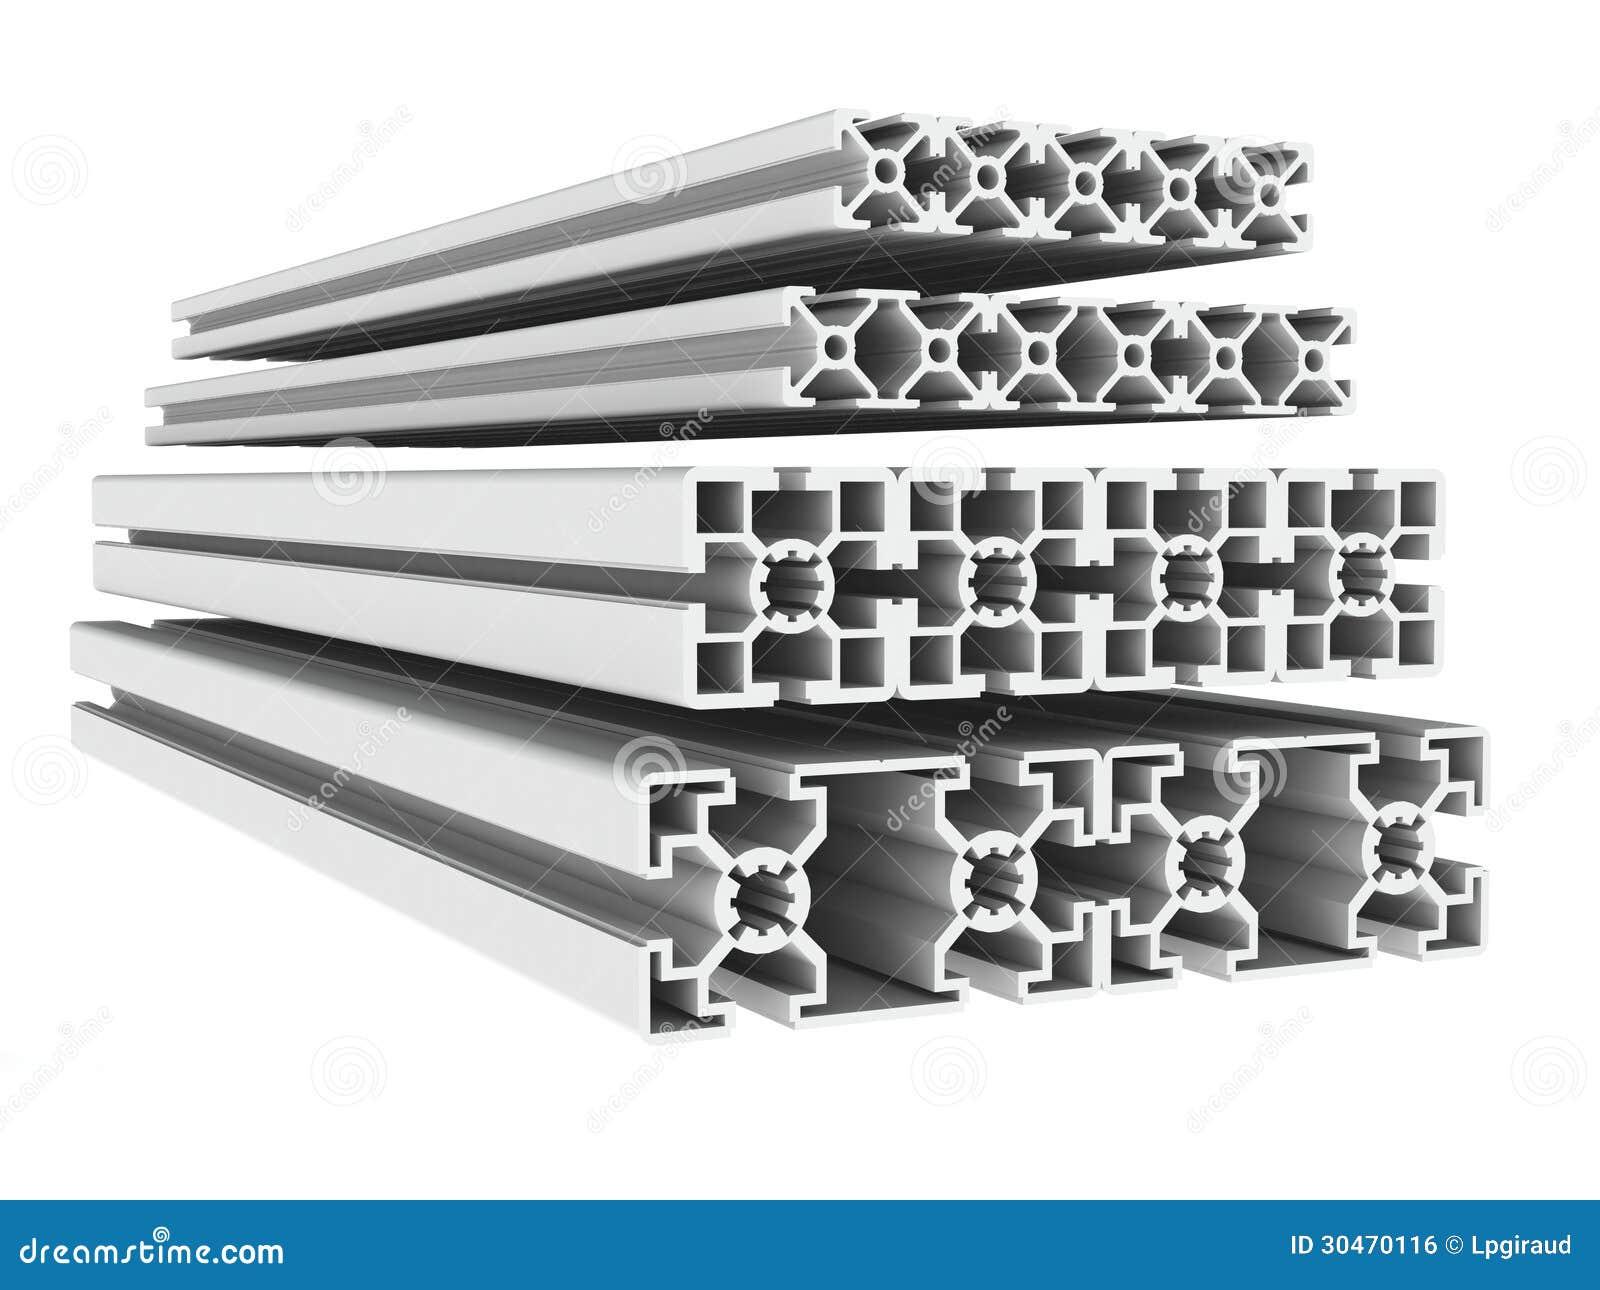 the metal profiles stock image 48668443. Black Bedroom Furniture Sets. Home Design Ideas